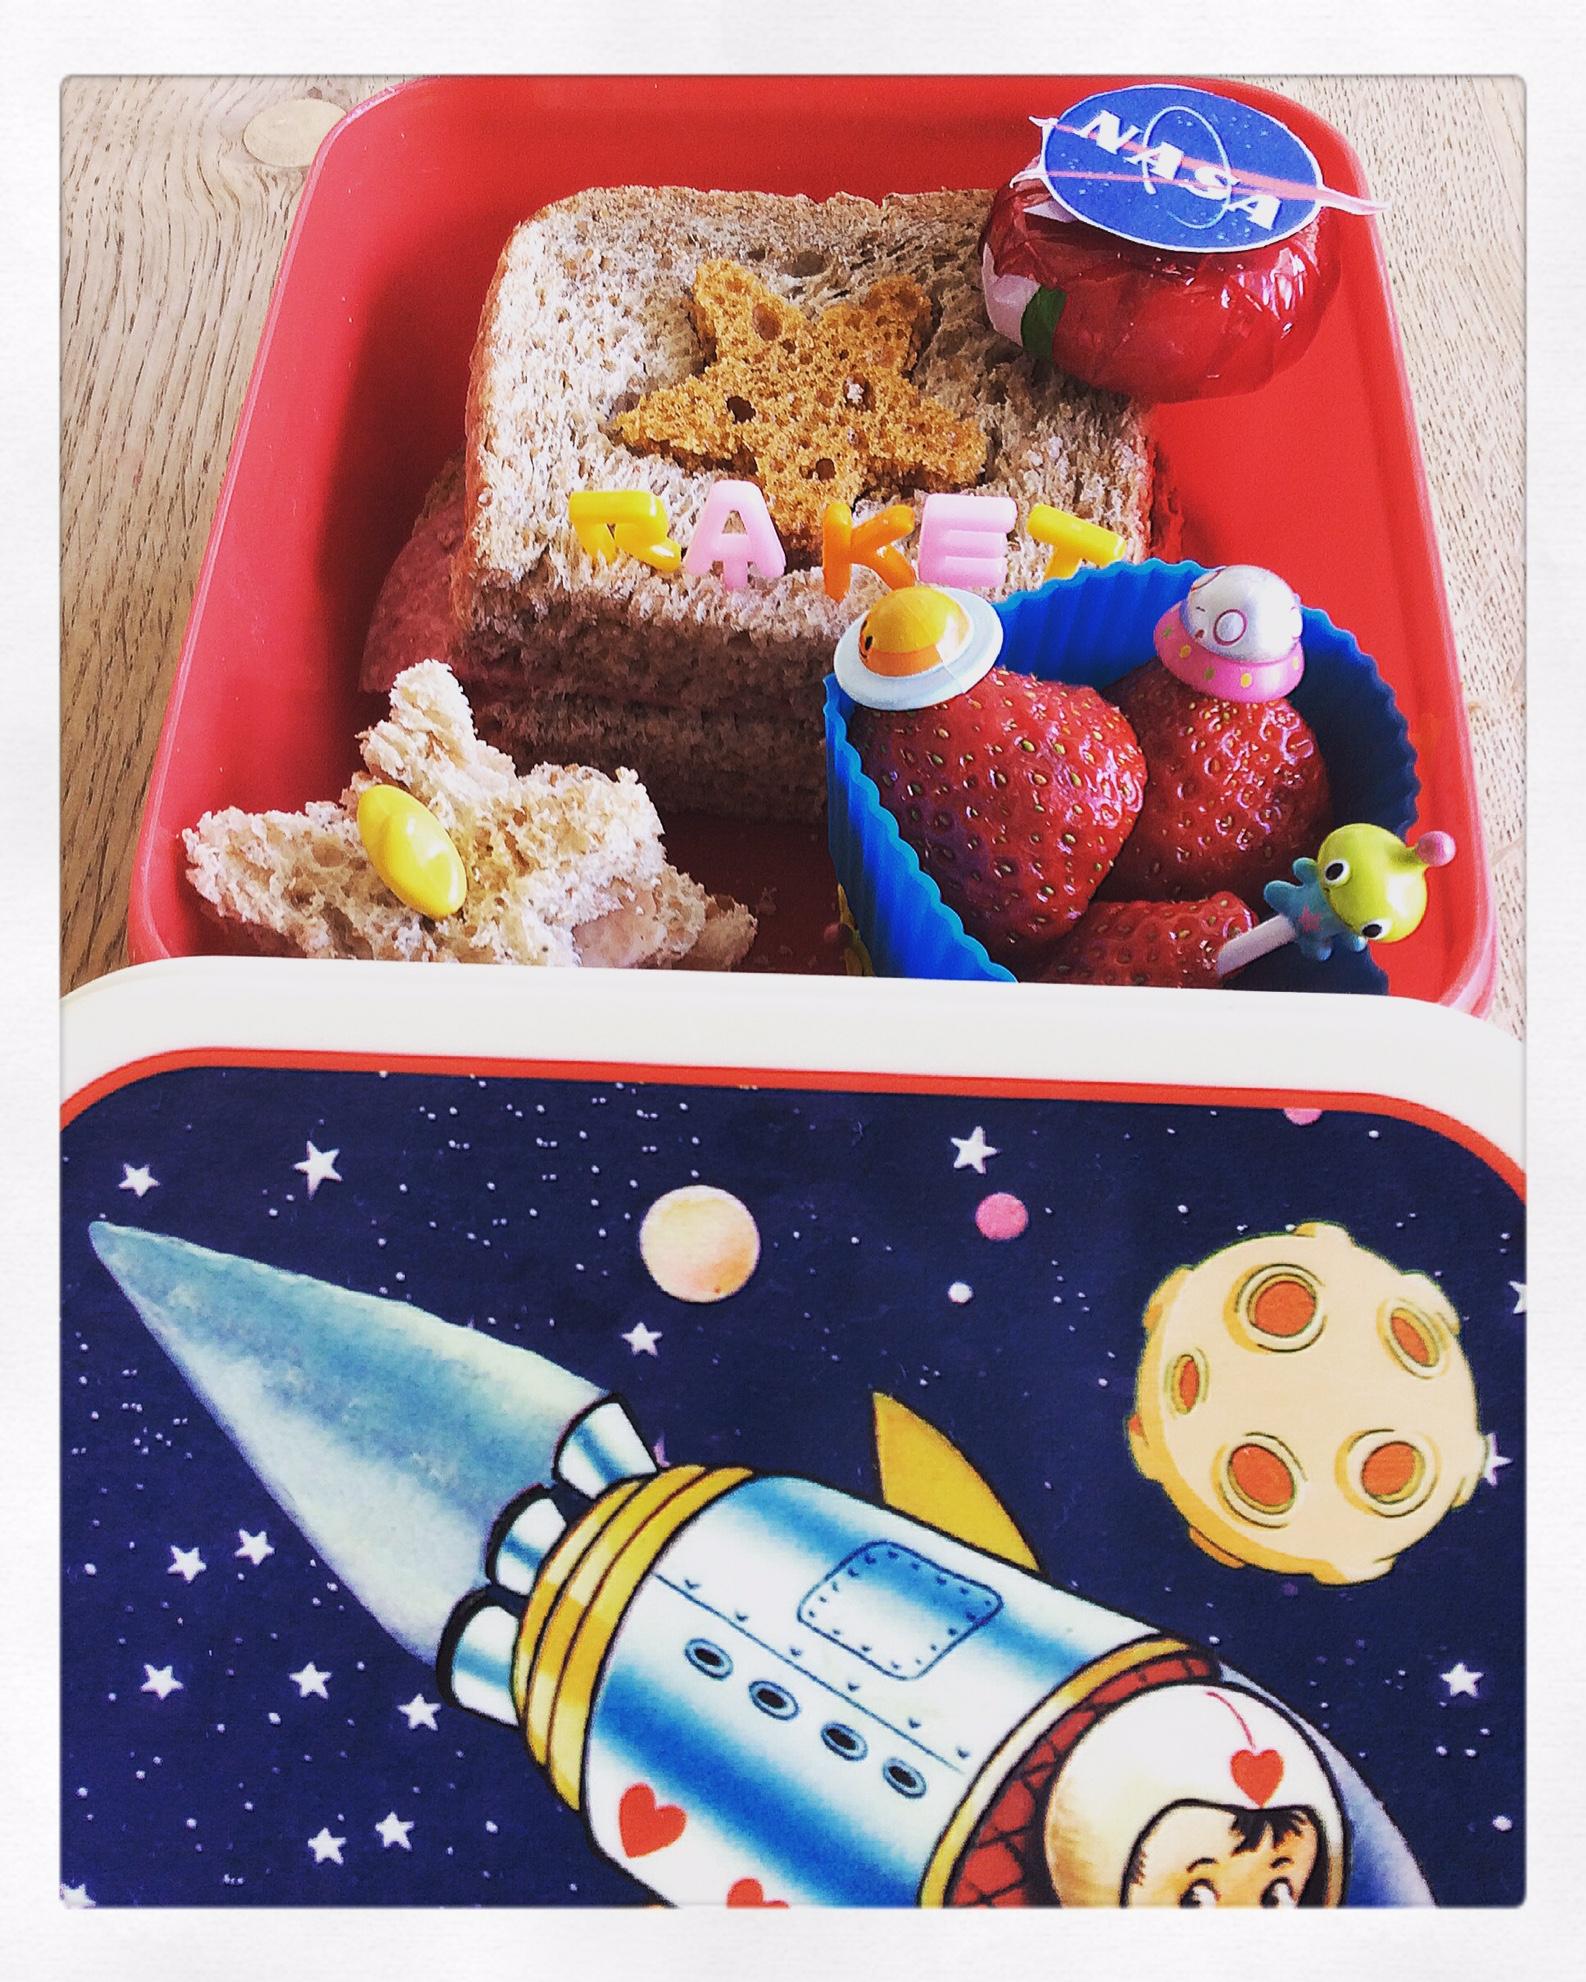 ruimteraket broodtrommel jongens